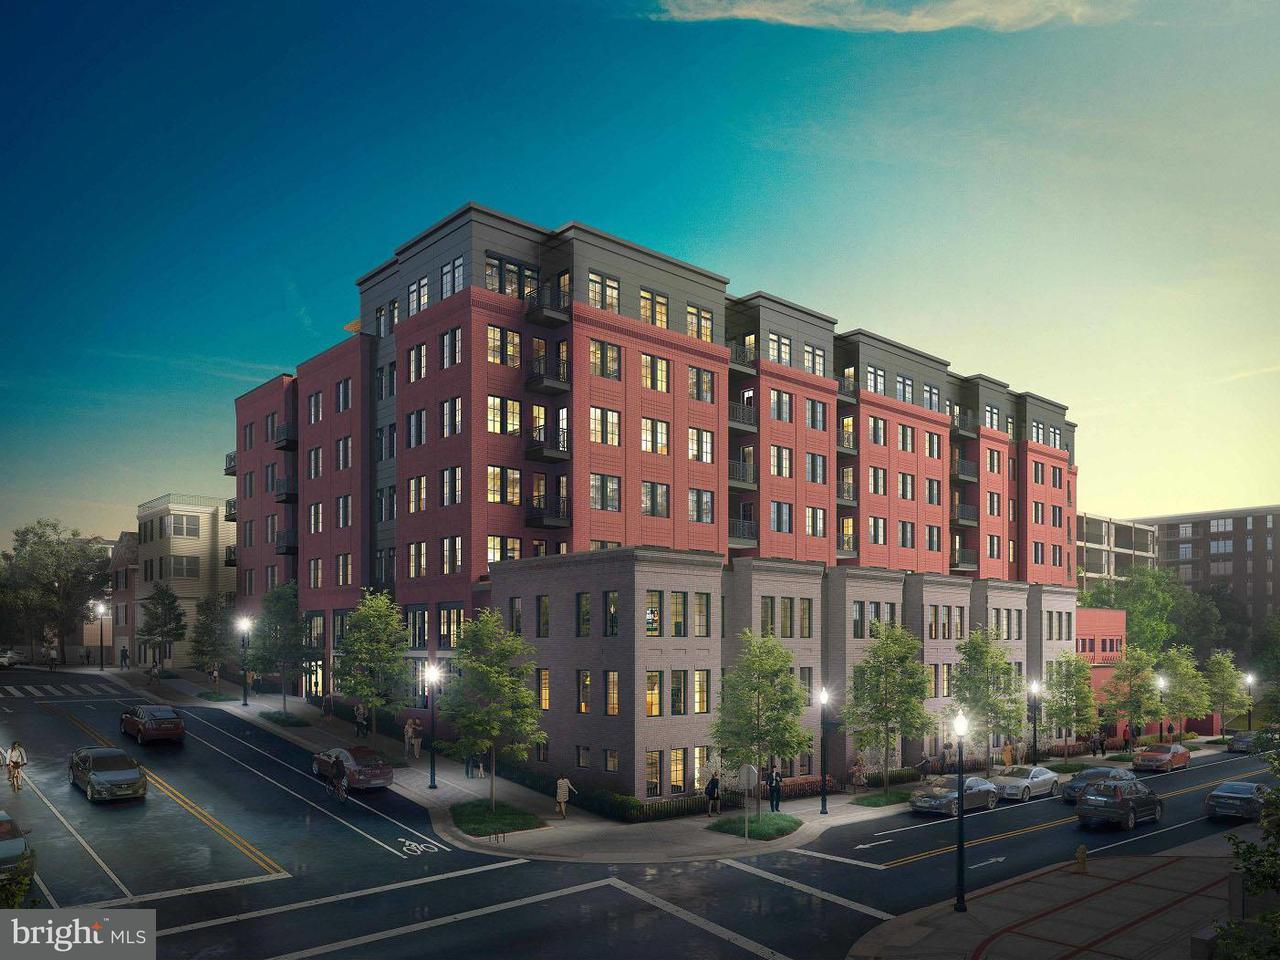 Condominium for Sale at 1411 KEY BLVD #405 1411 KEY BLVD #405 Arlington, Virginia 22209 United States